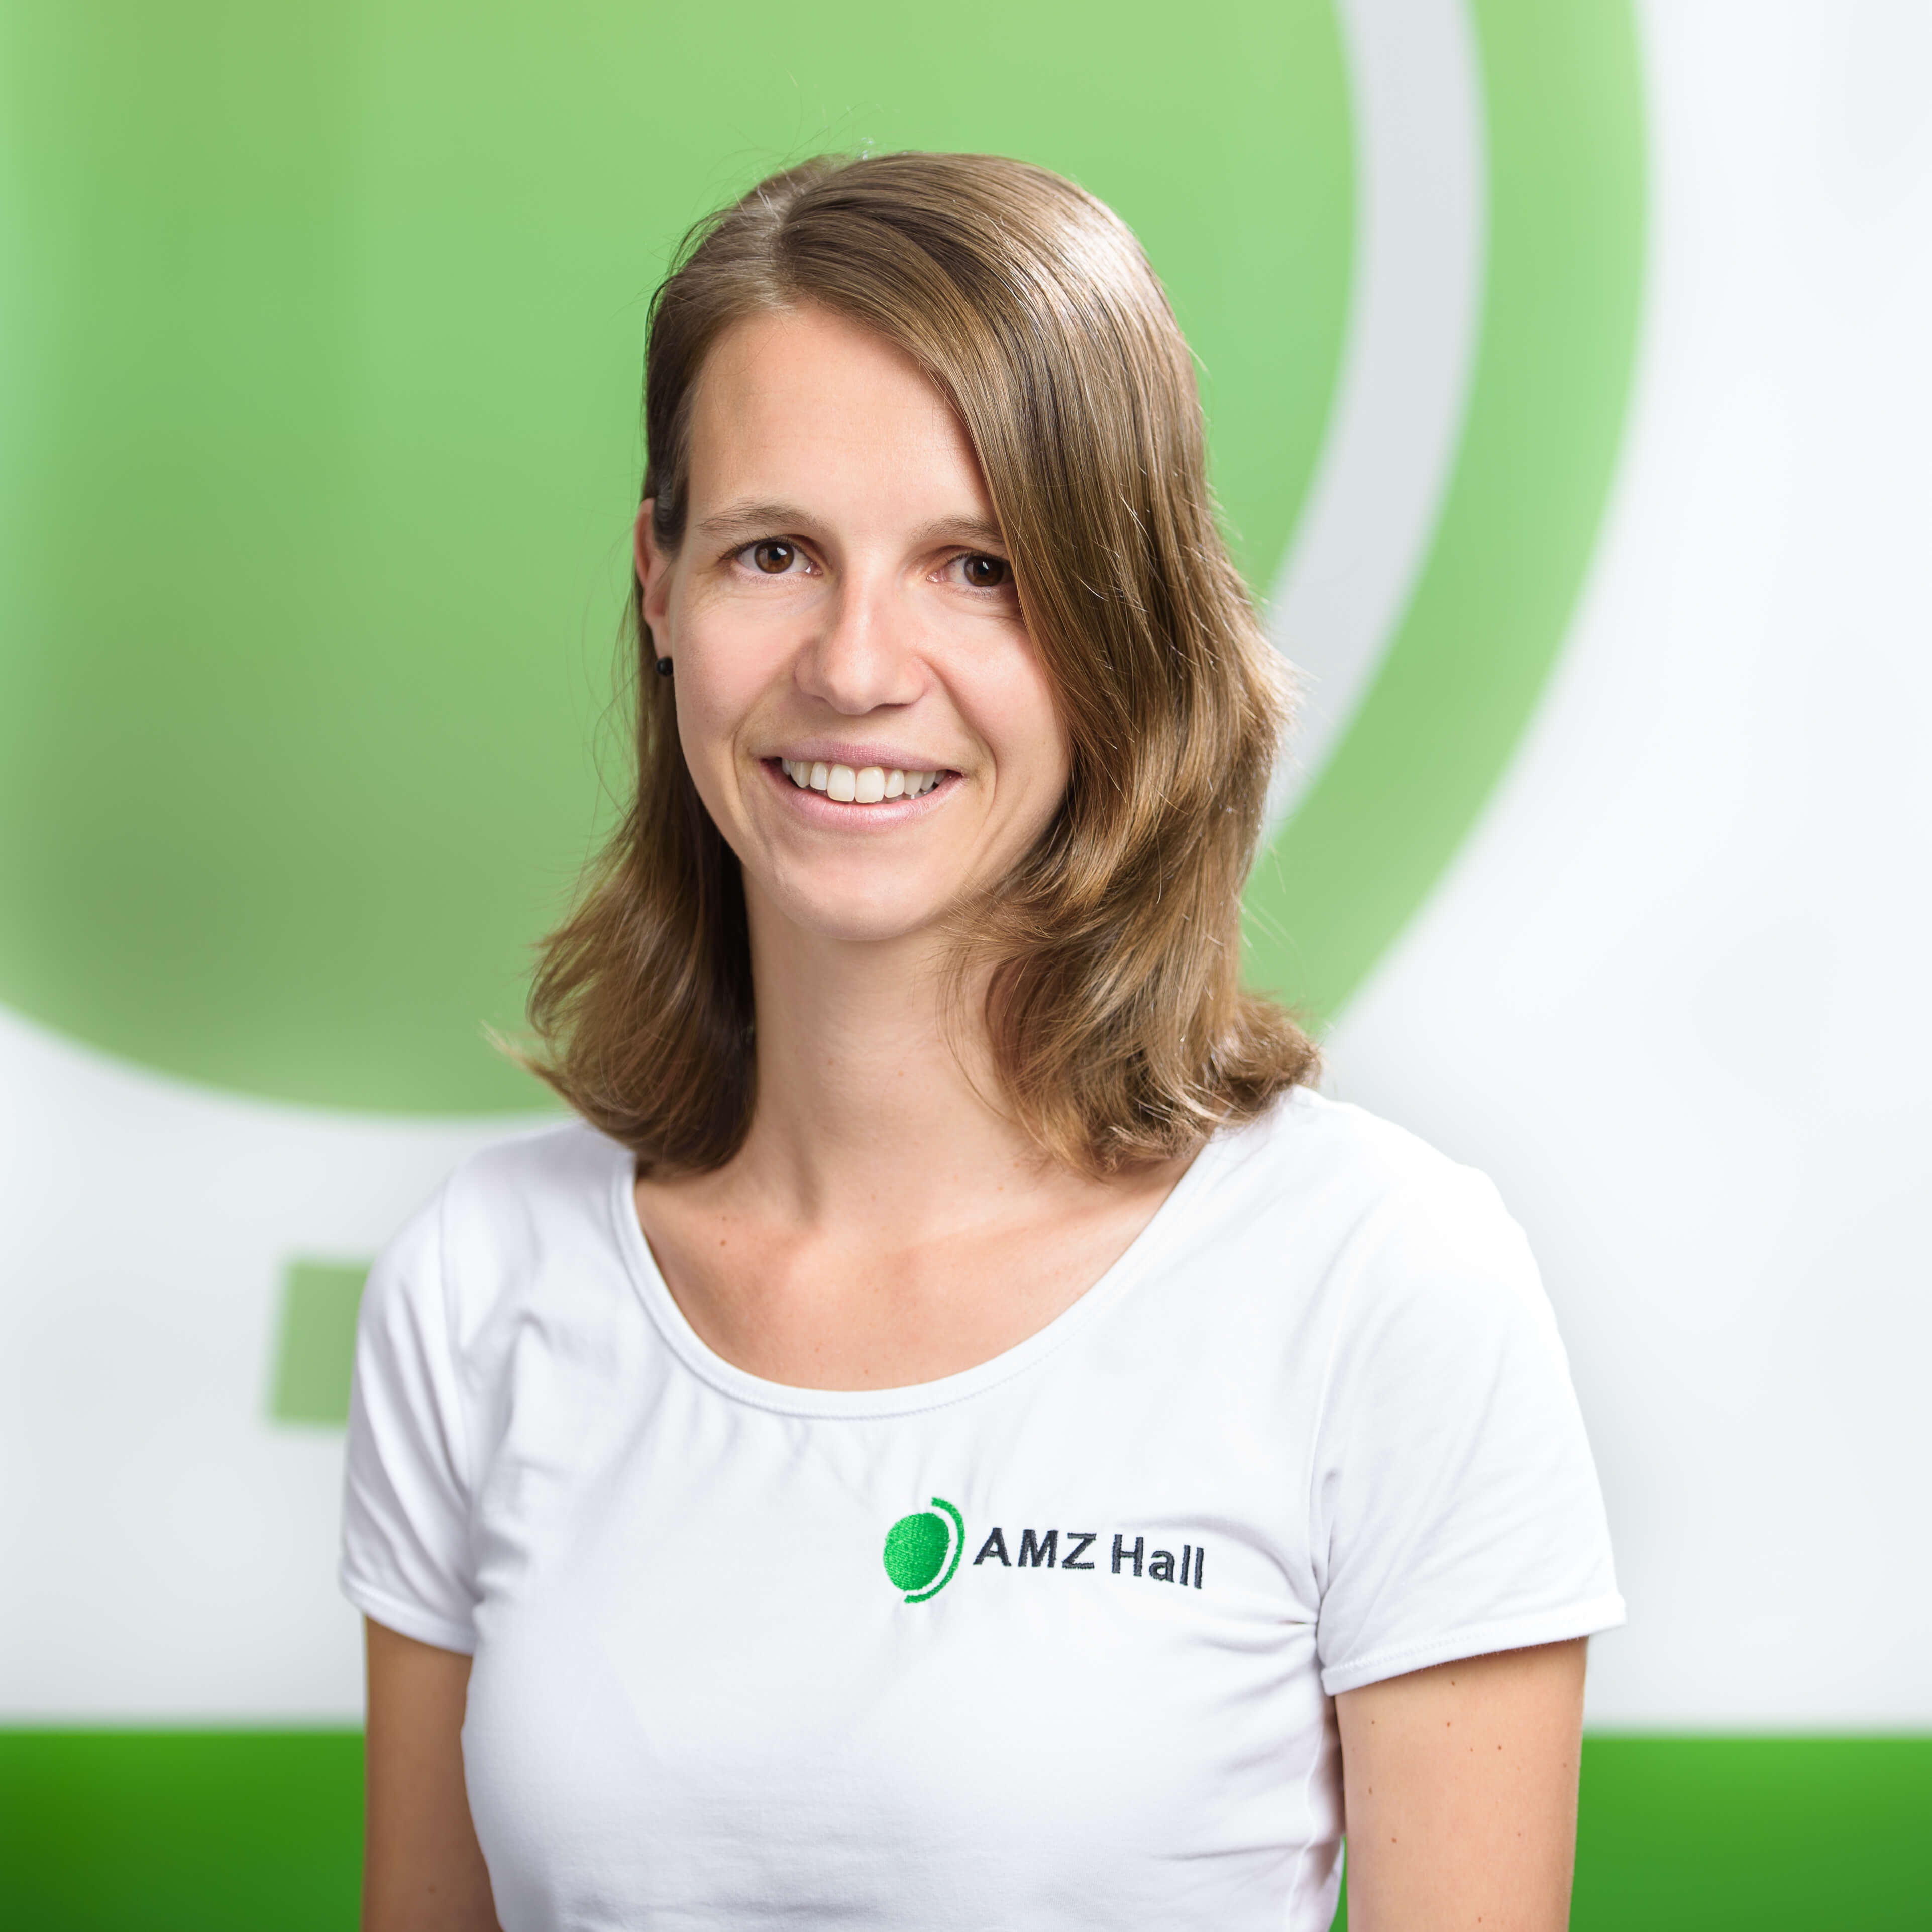 Dr. Christine Weger